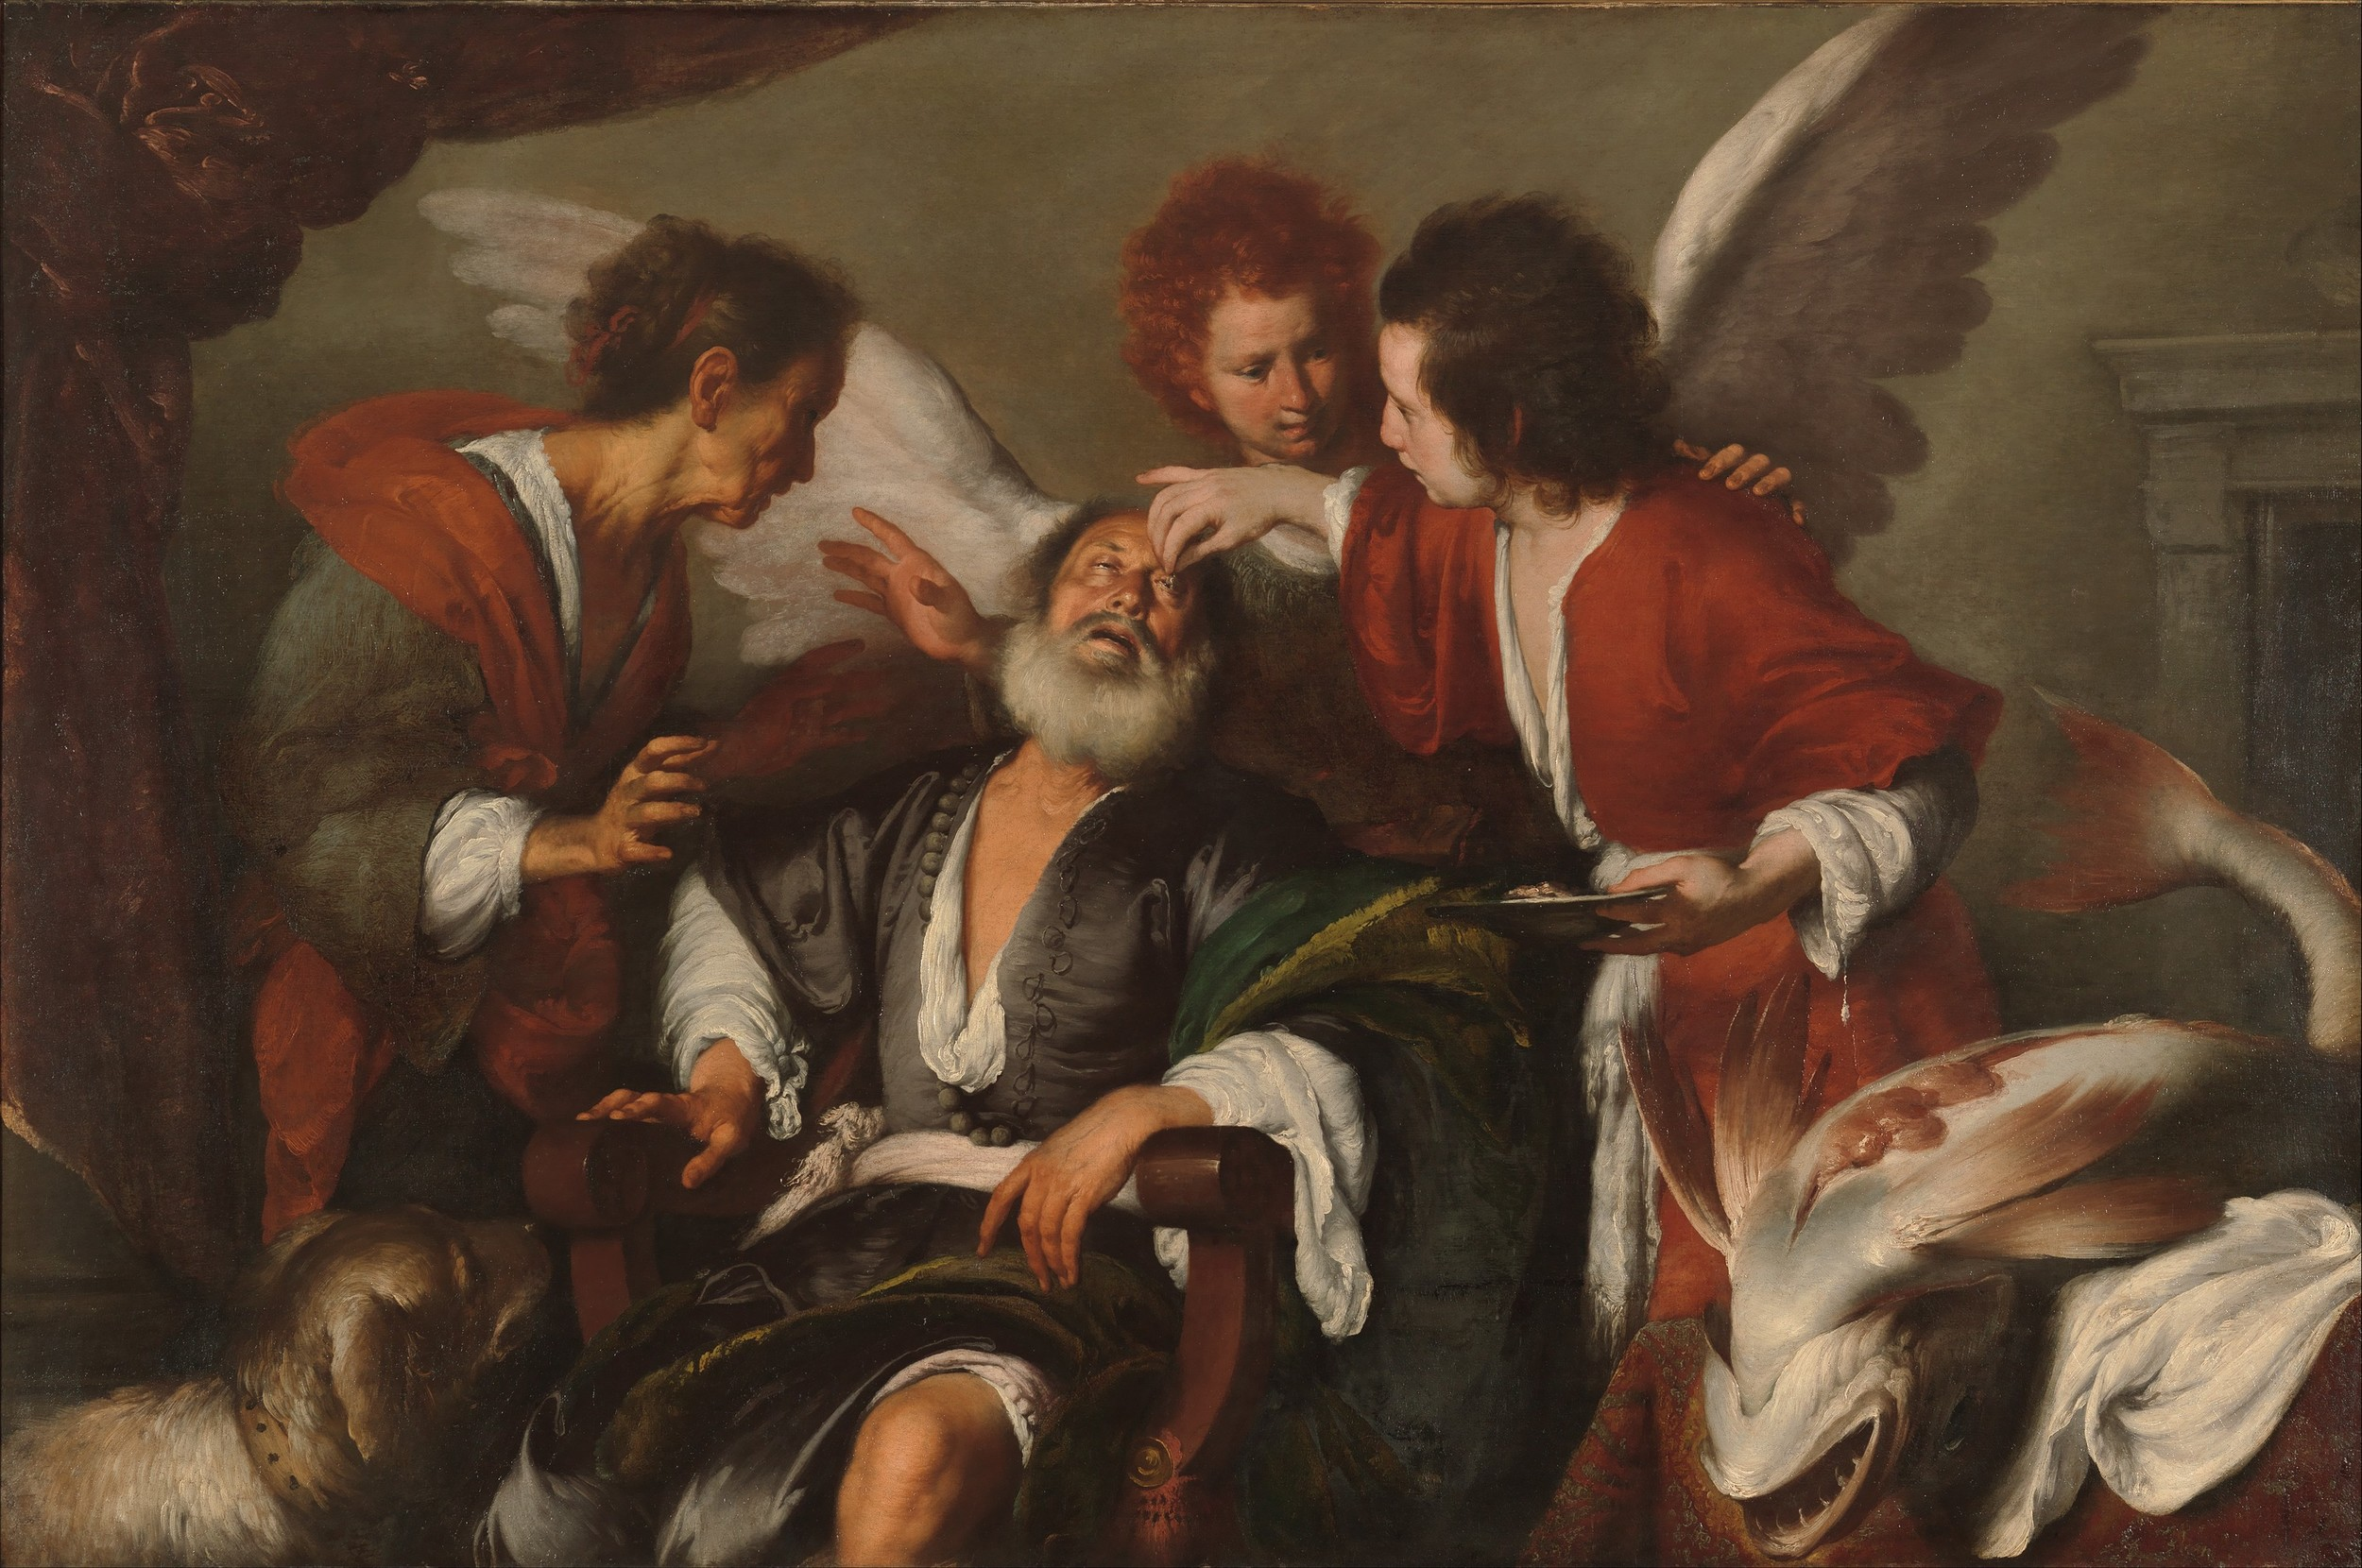 Bernardo Strozzi, The Healing Of Tobit, c.1635, oil on canvas, 66 x 81in, Hermitage, St. Petersburg